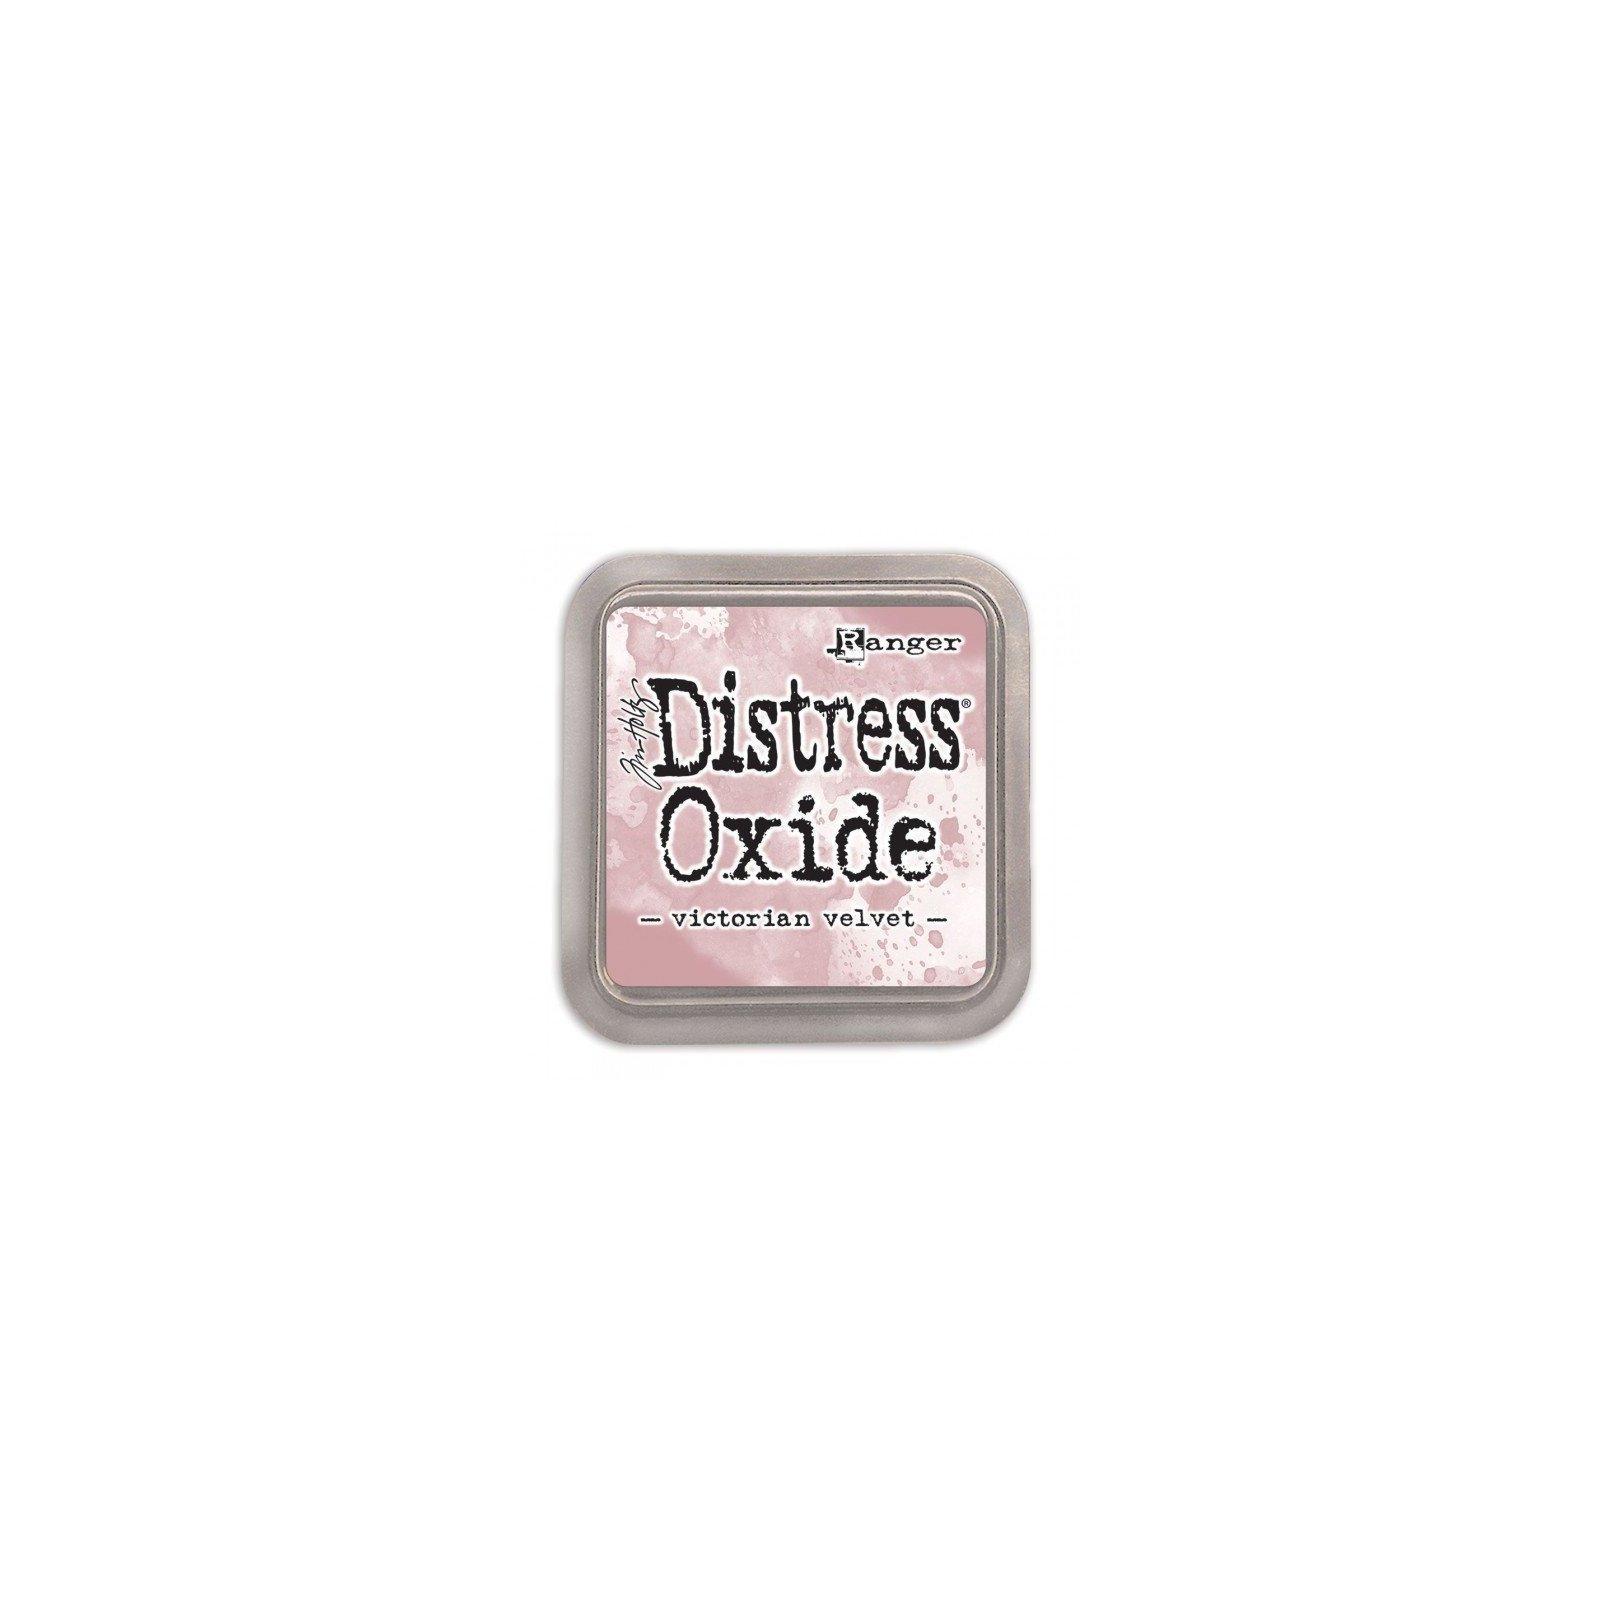 Grand encreur mauve Distress Oxide - Victorian Velvet - Ranger